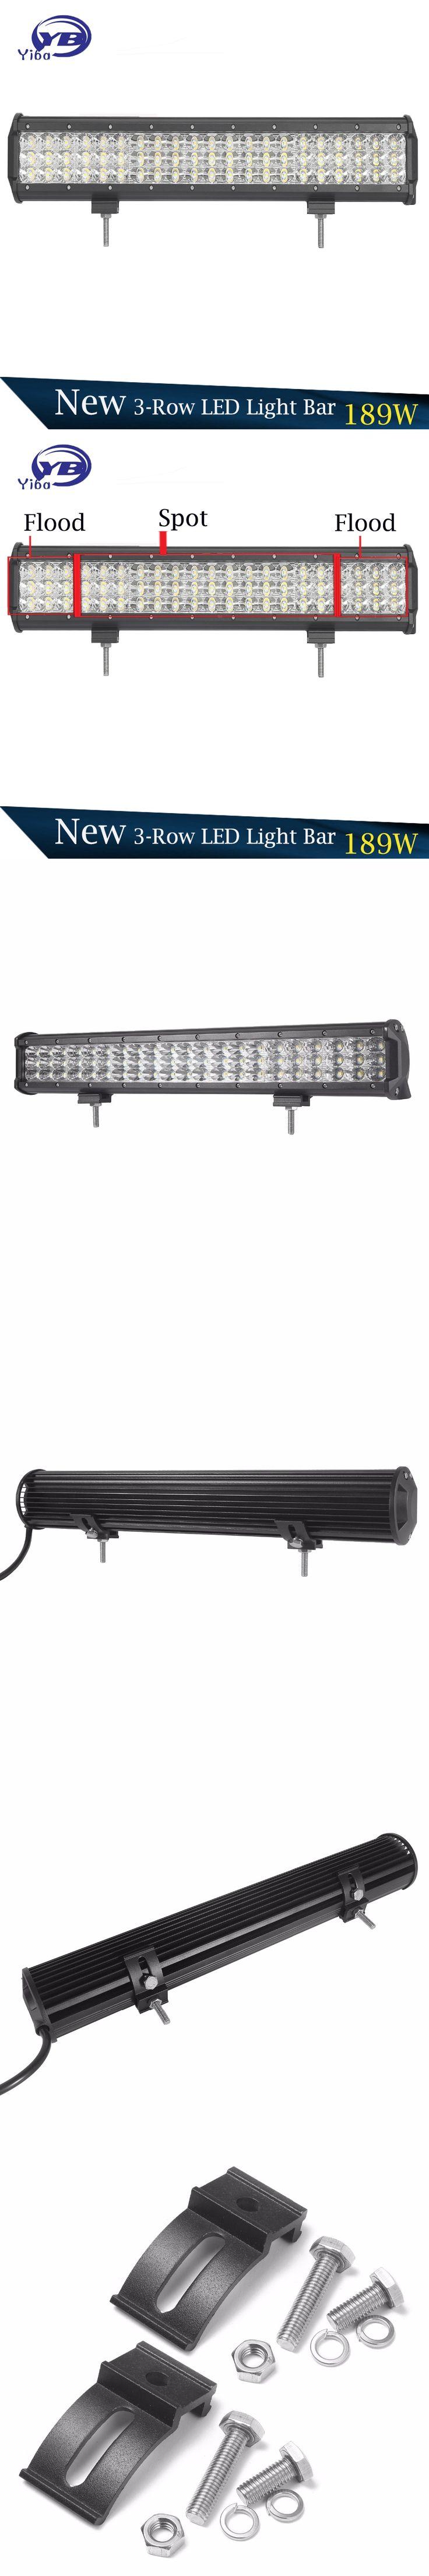 Best 25+ Led light bars ideas on Pinterest   Jeep light bar, Jeep ...